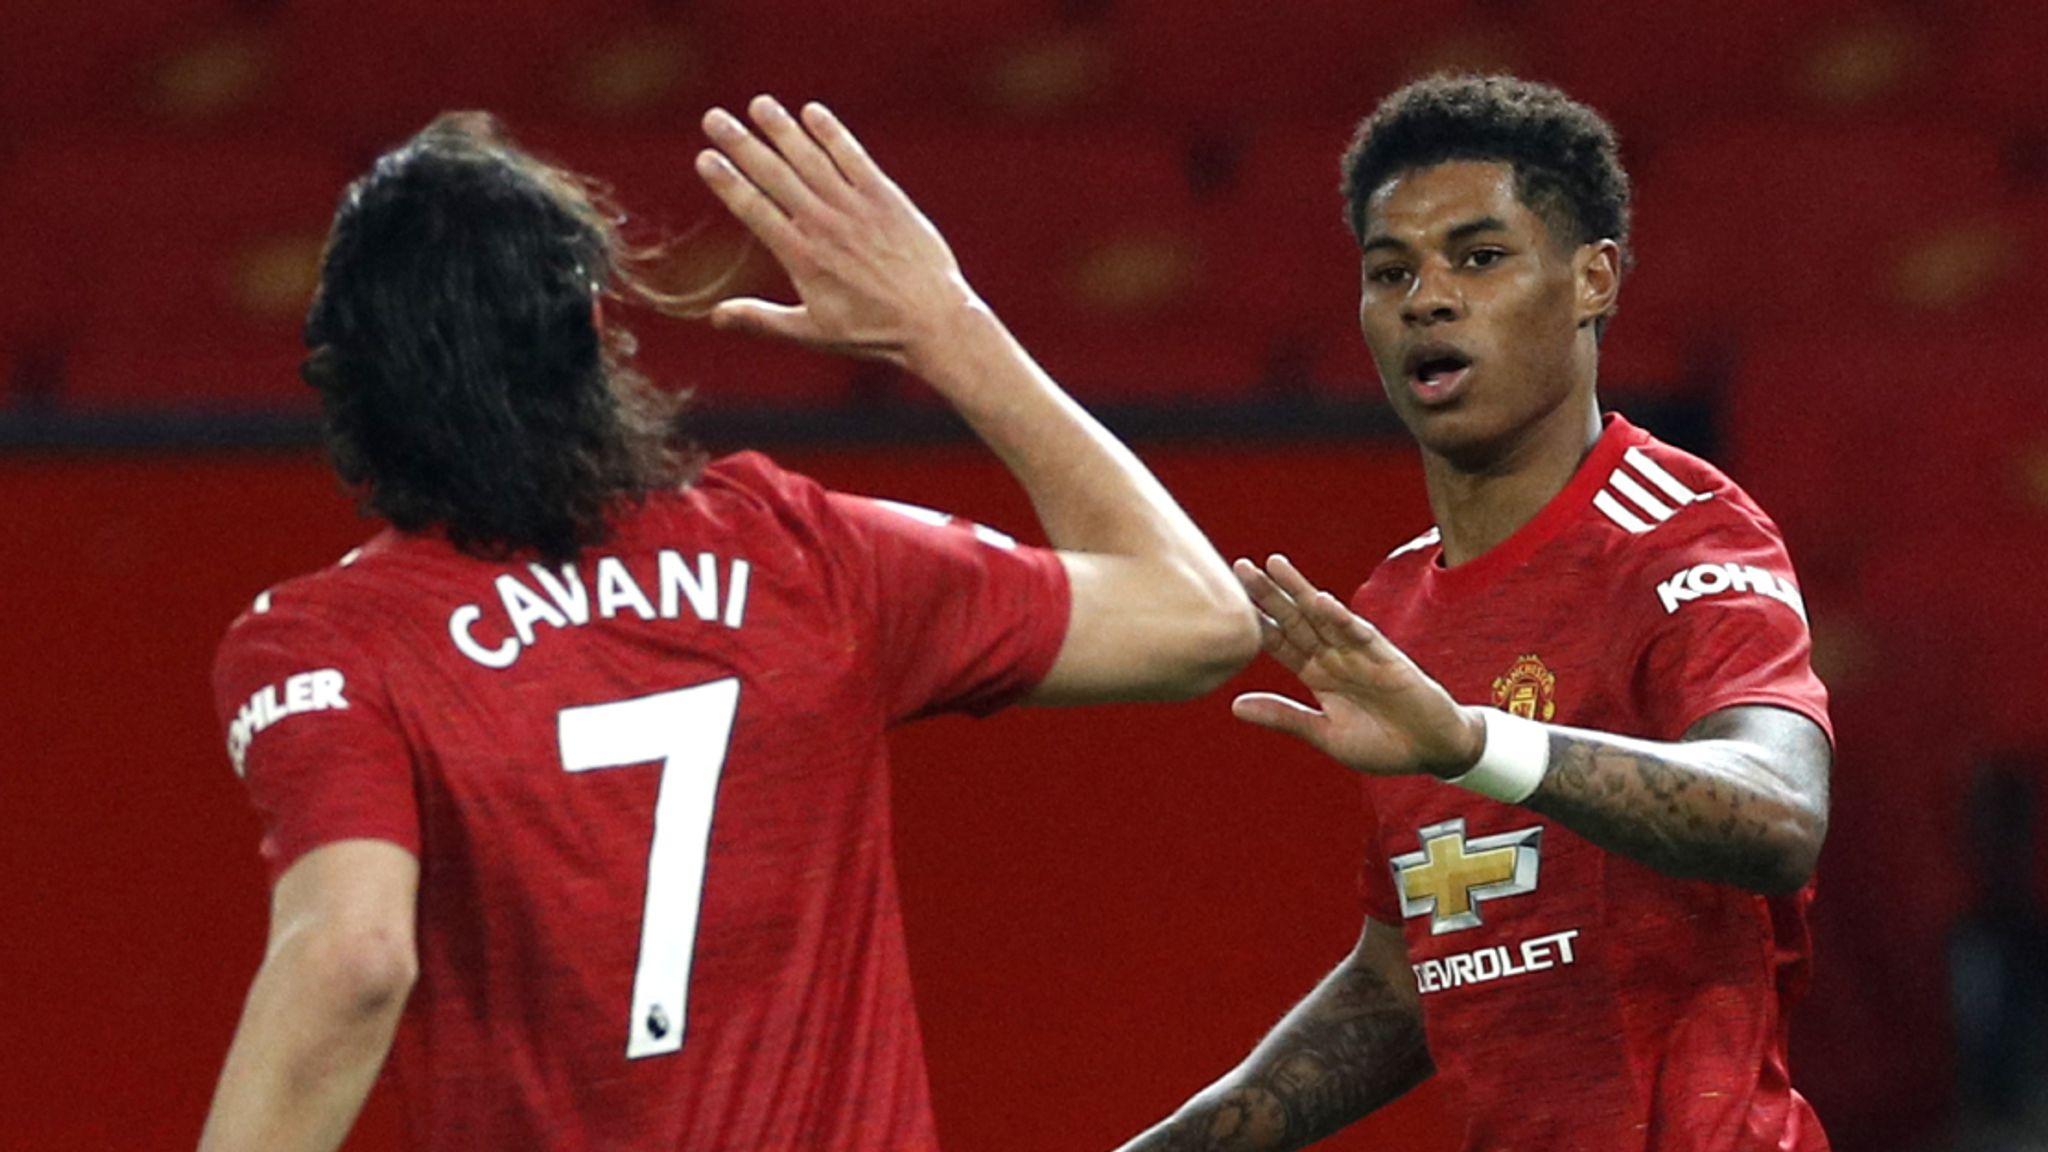 Granada vs Manchester United preview, team news, stats, kick-off time |  Football News | Sky Sports